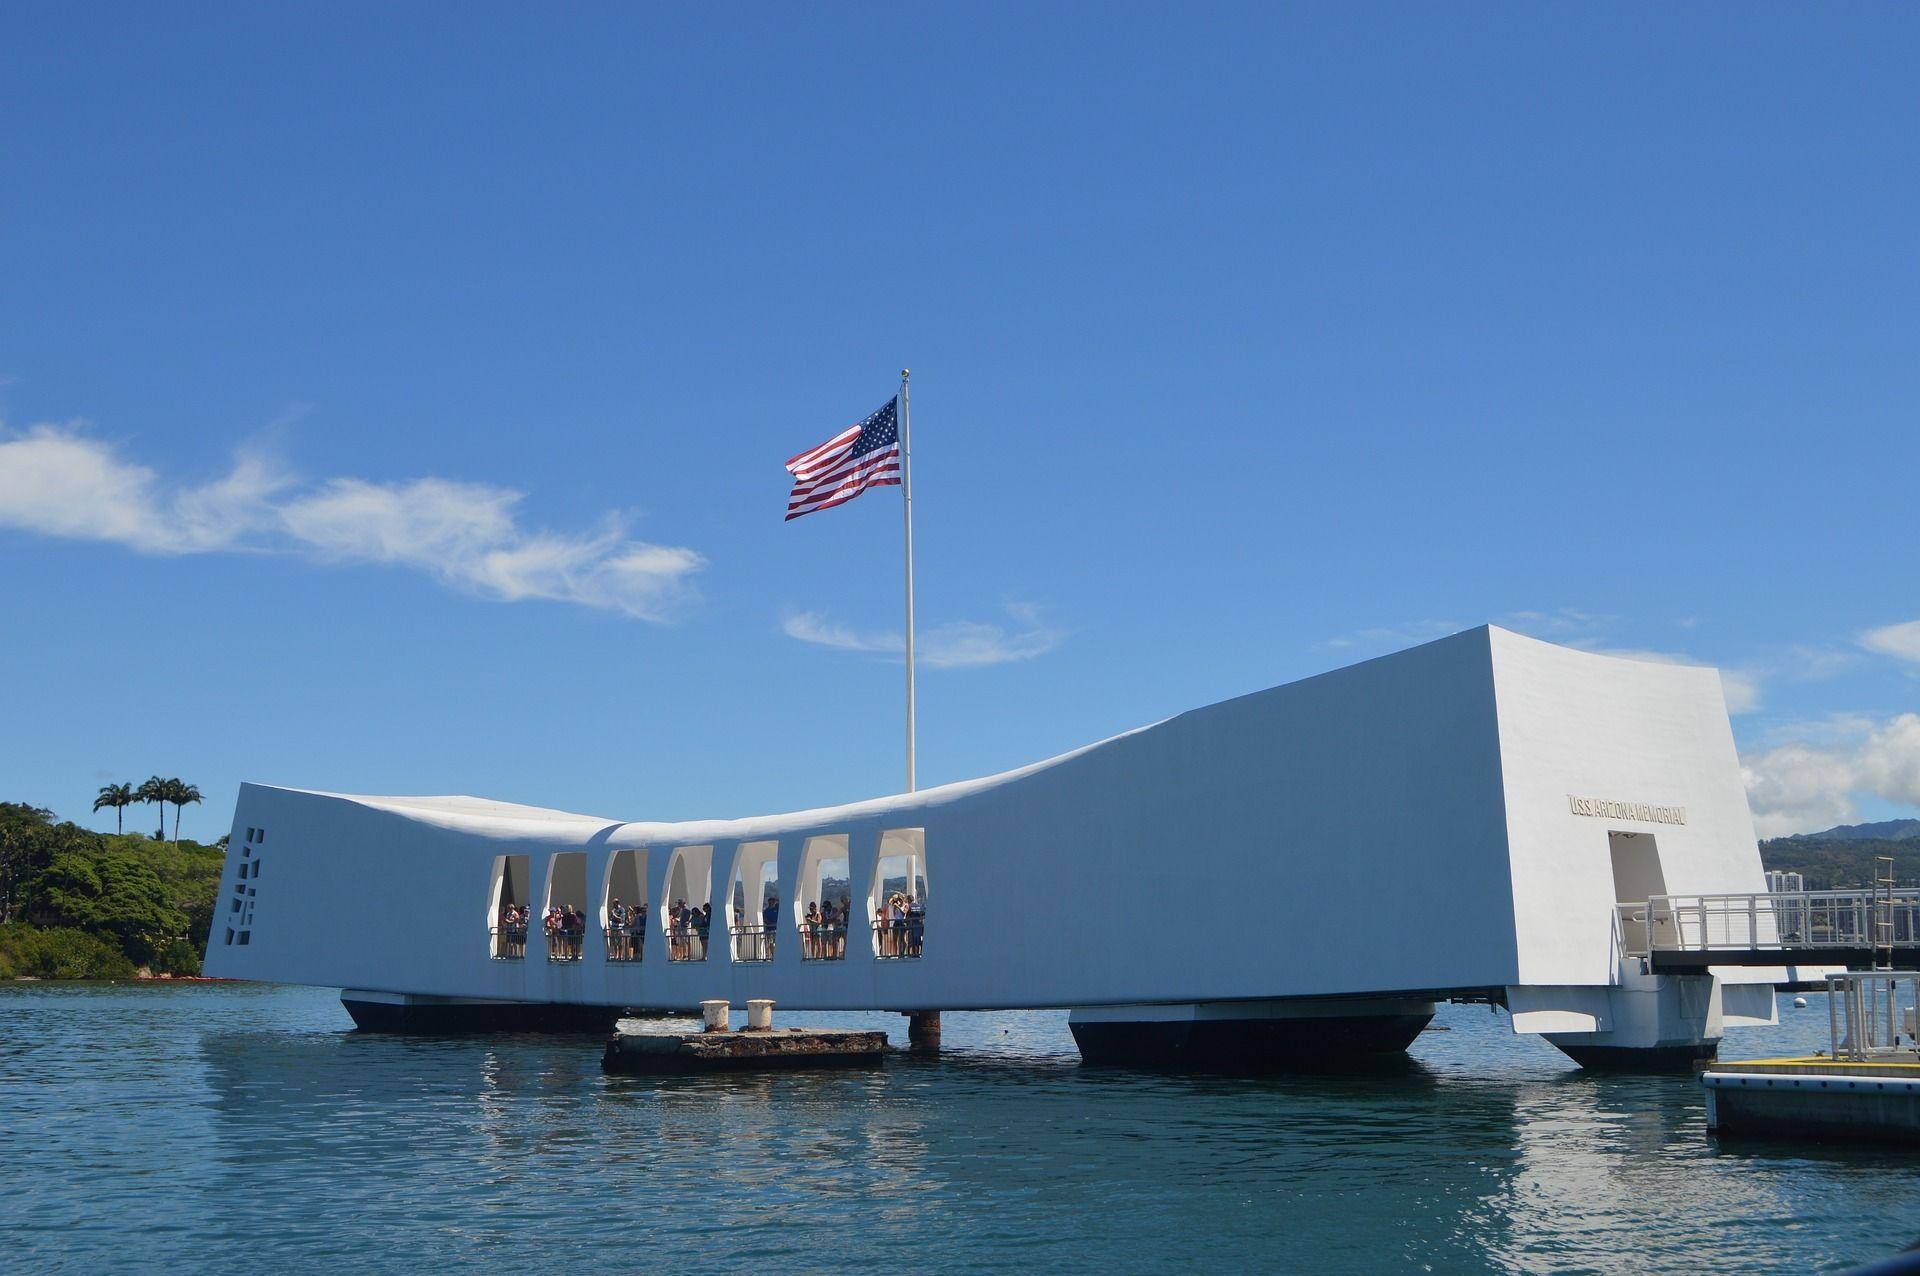 The USS Arizona Memorial at Pearl Harbor, Hawaii